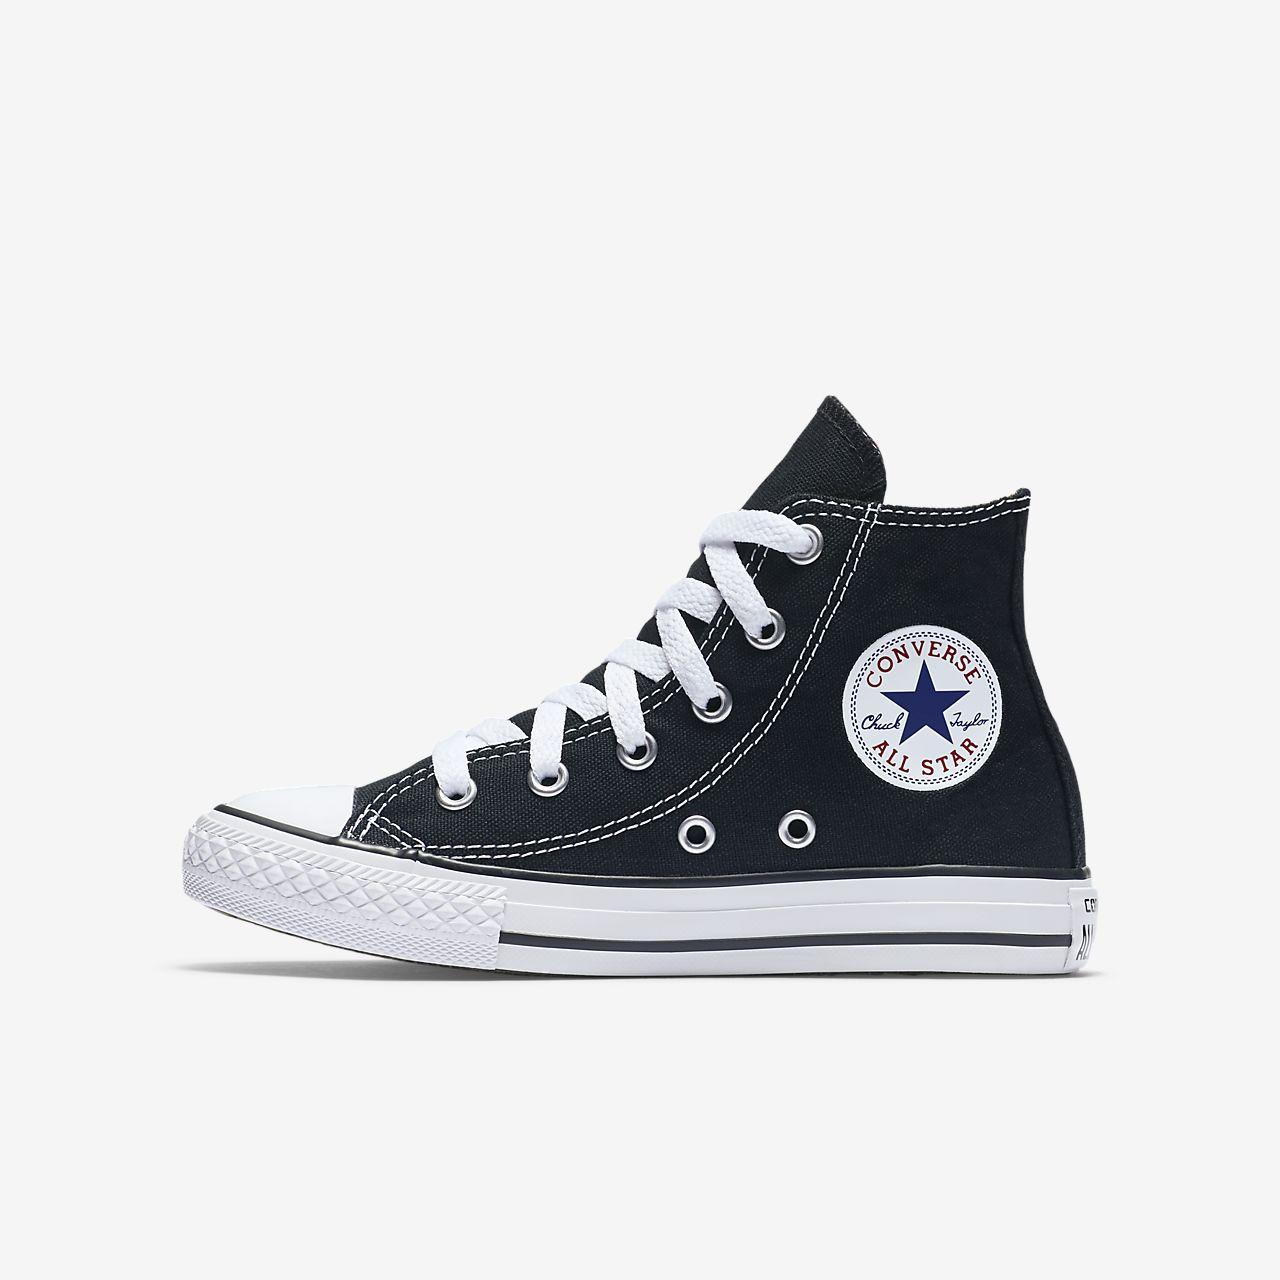 plus de photos 3ad8c 05866 Converse Chuck Taylor All Star High Top Little Kids' Shoe